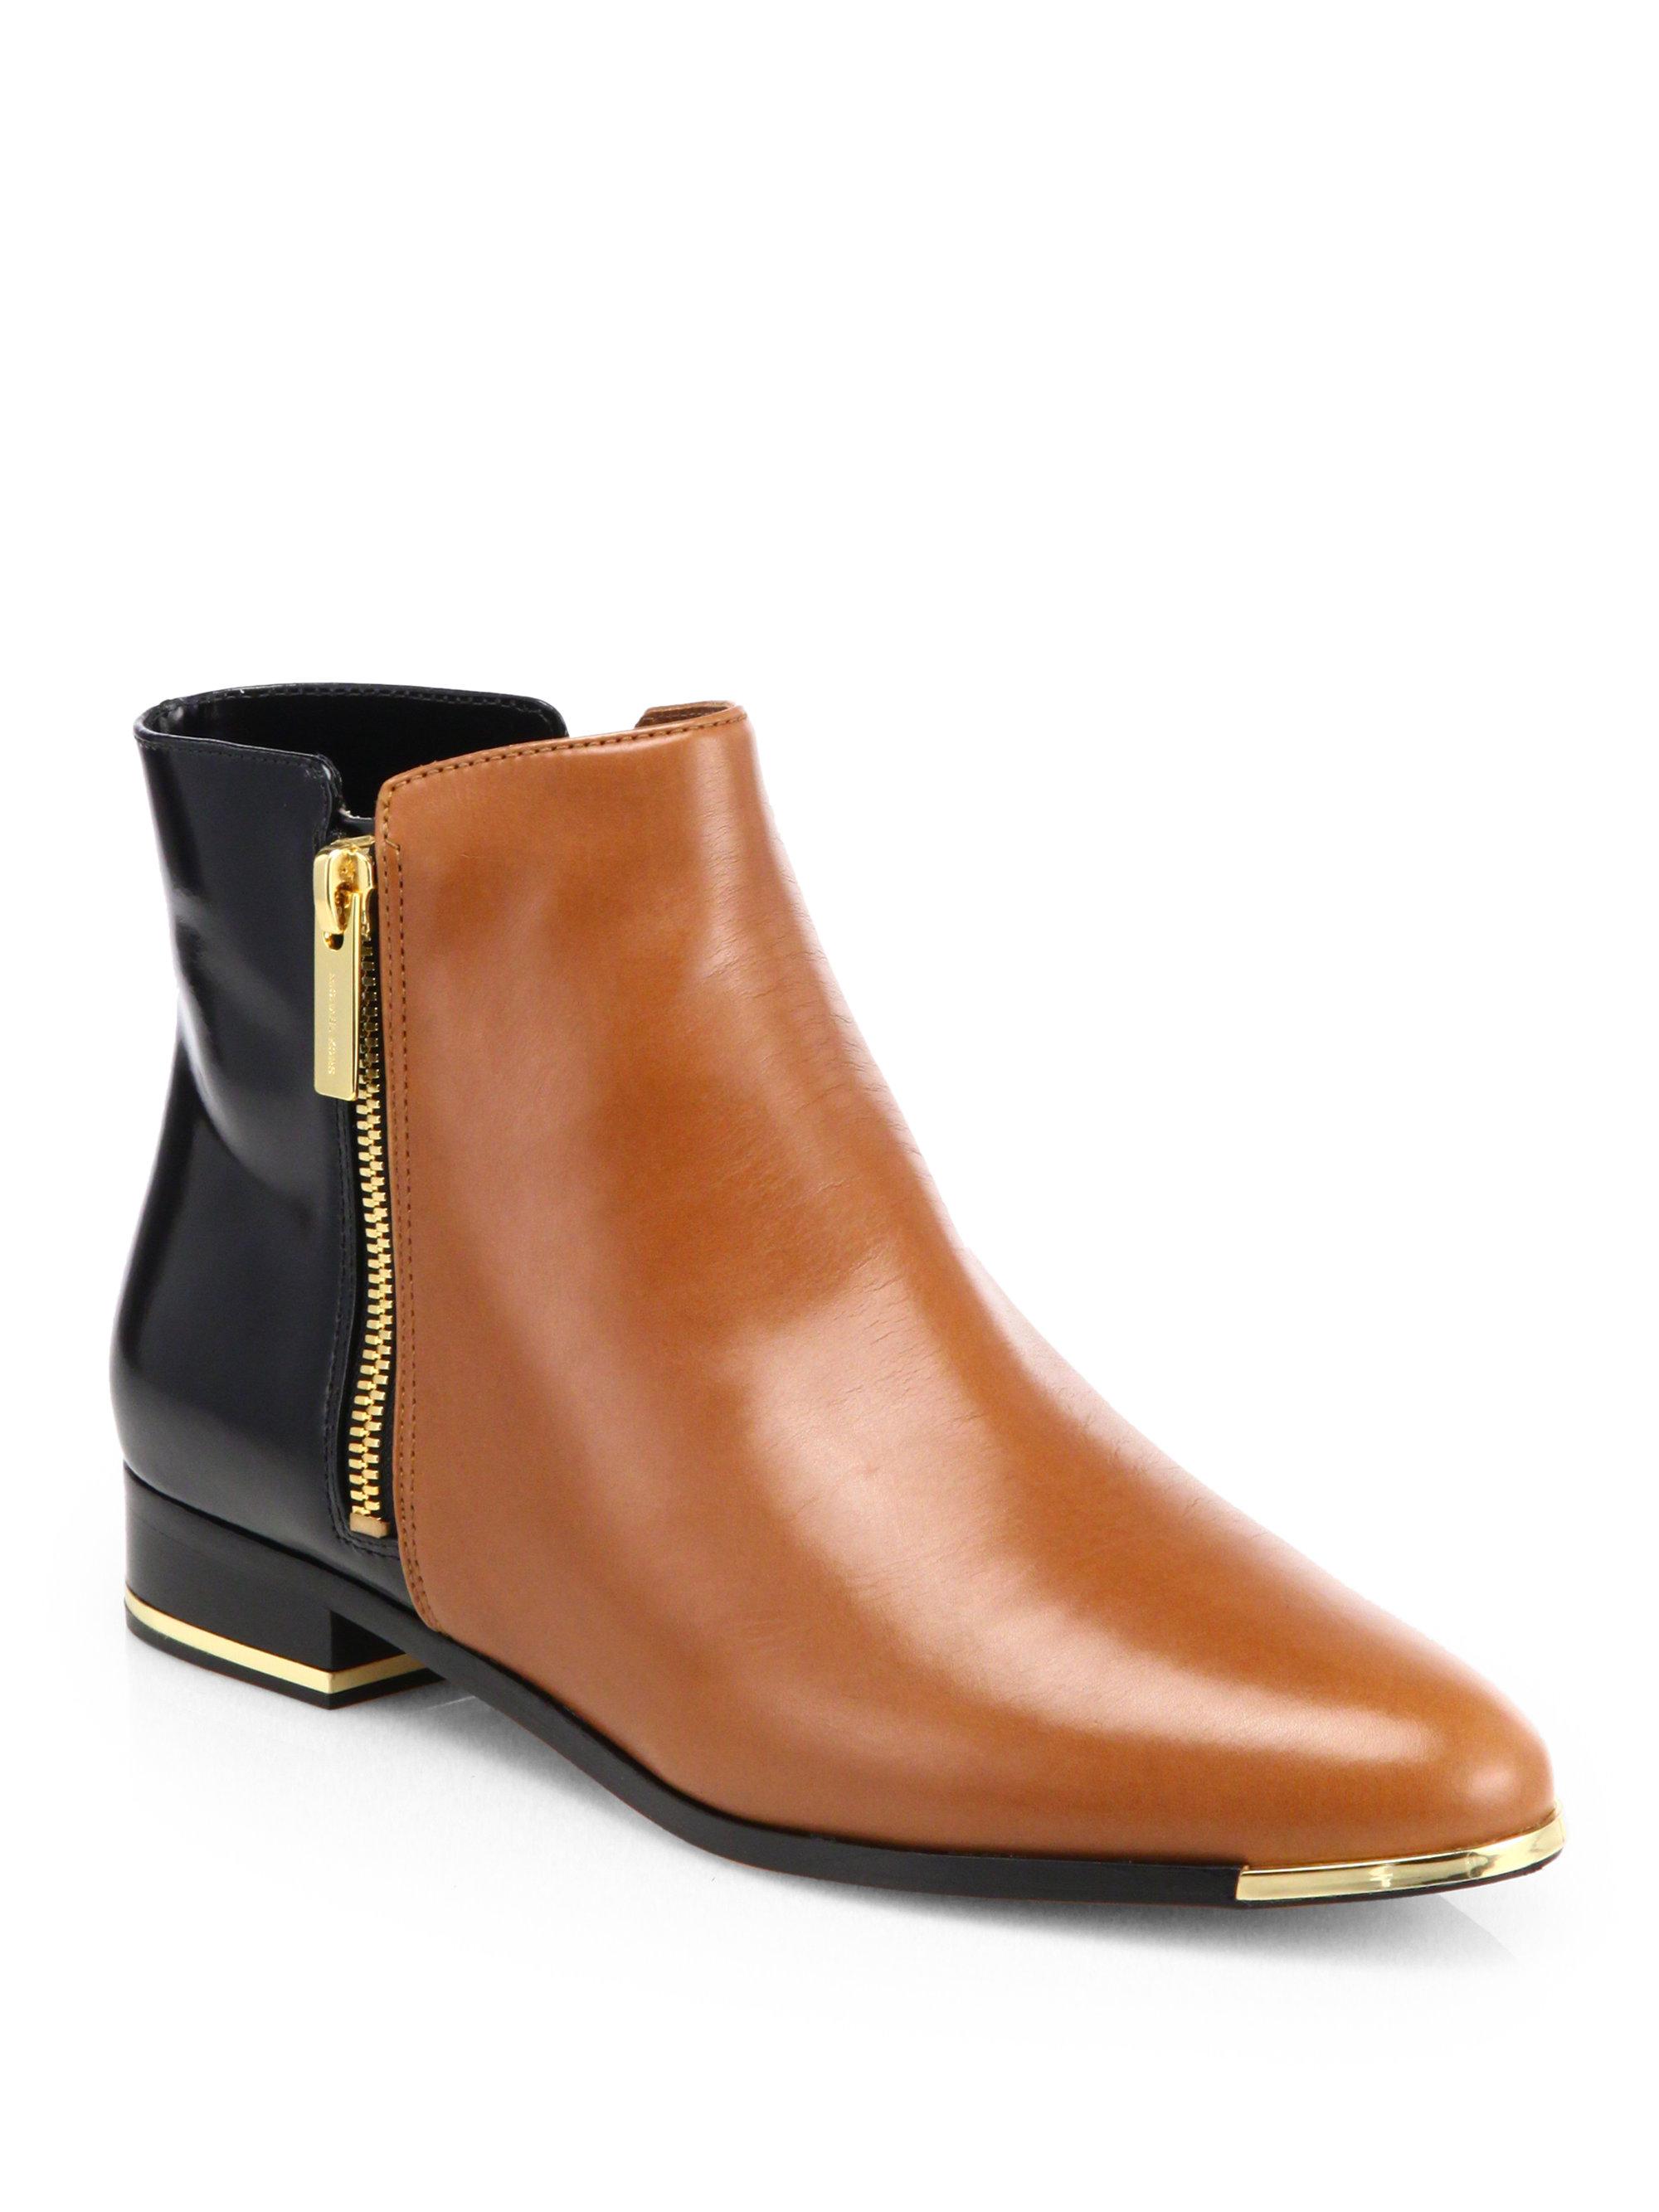 michael kors cindra ankle boots in brown brown black lyst. Black Bedroom Furniture Sets. Home Design Ideas